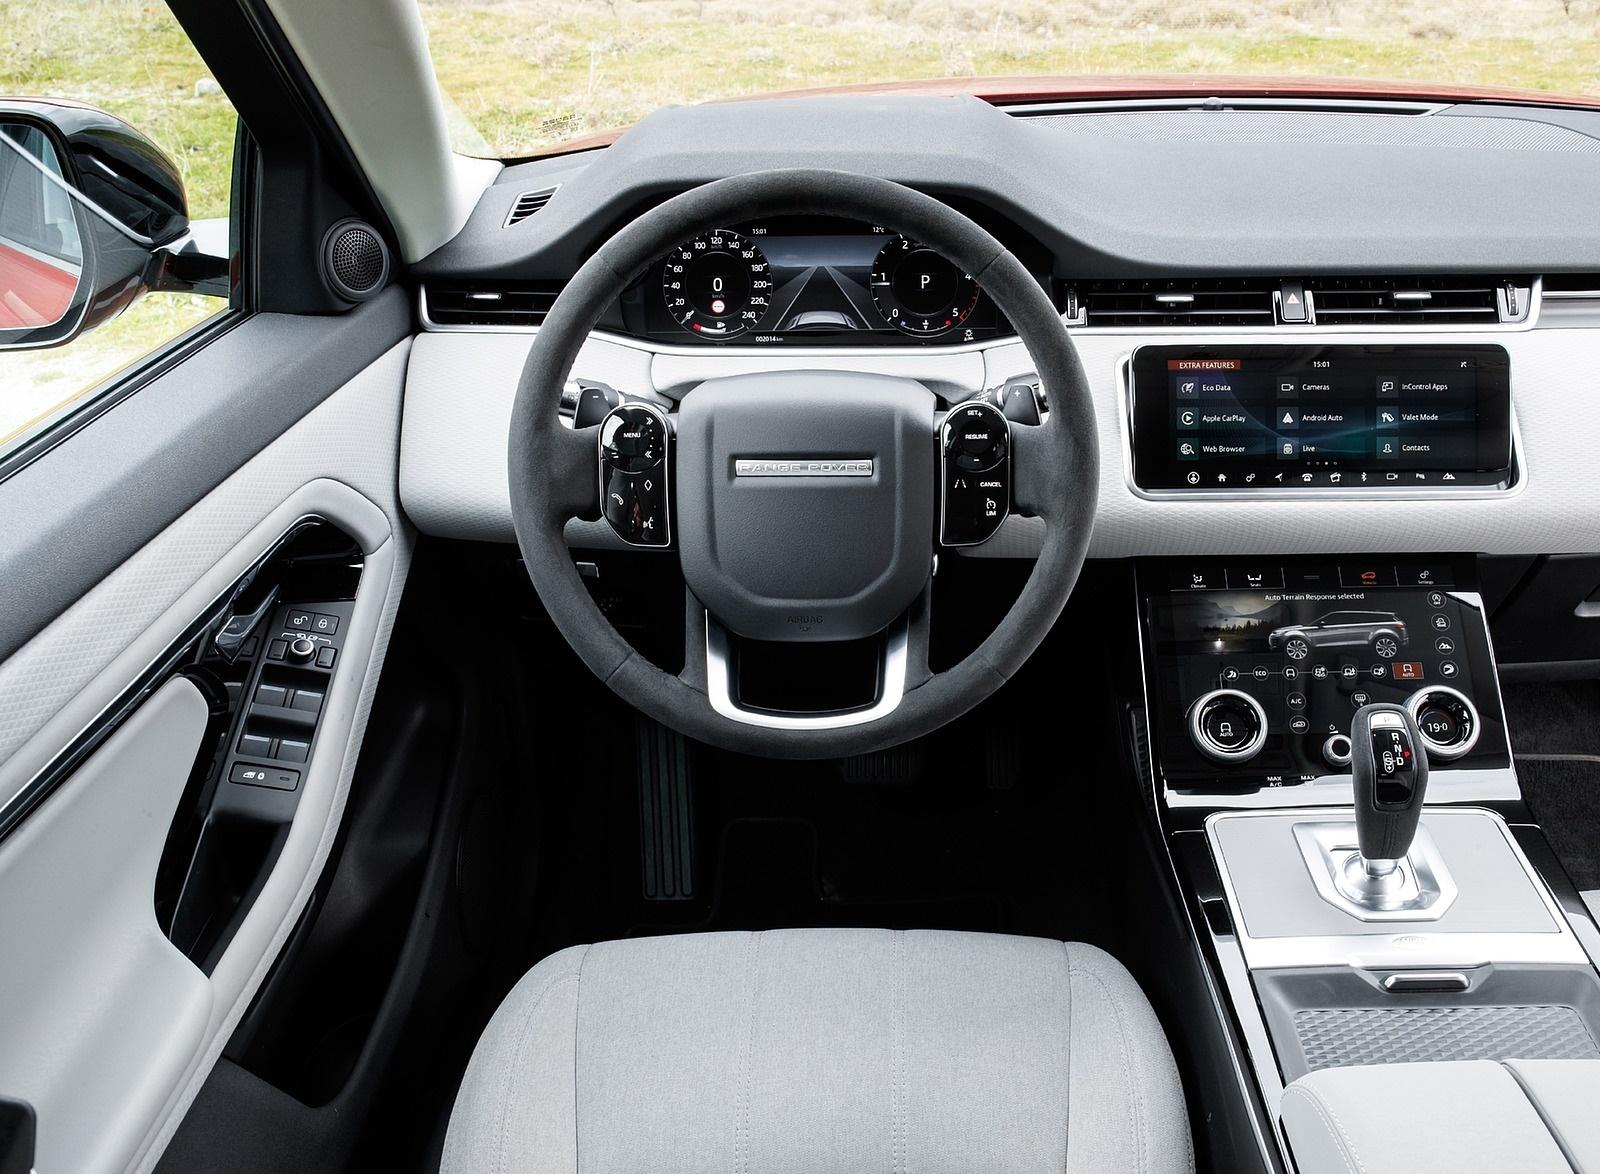 2020 Range Rover Evoque Interior Cockpit Wallpapers (15)